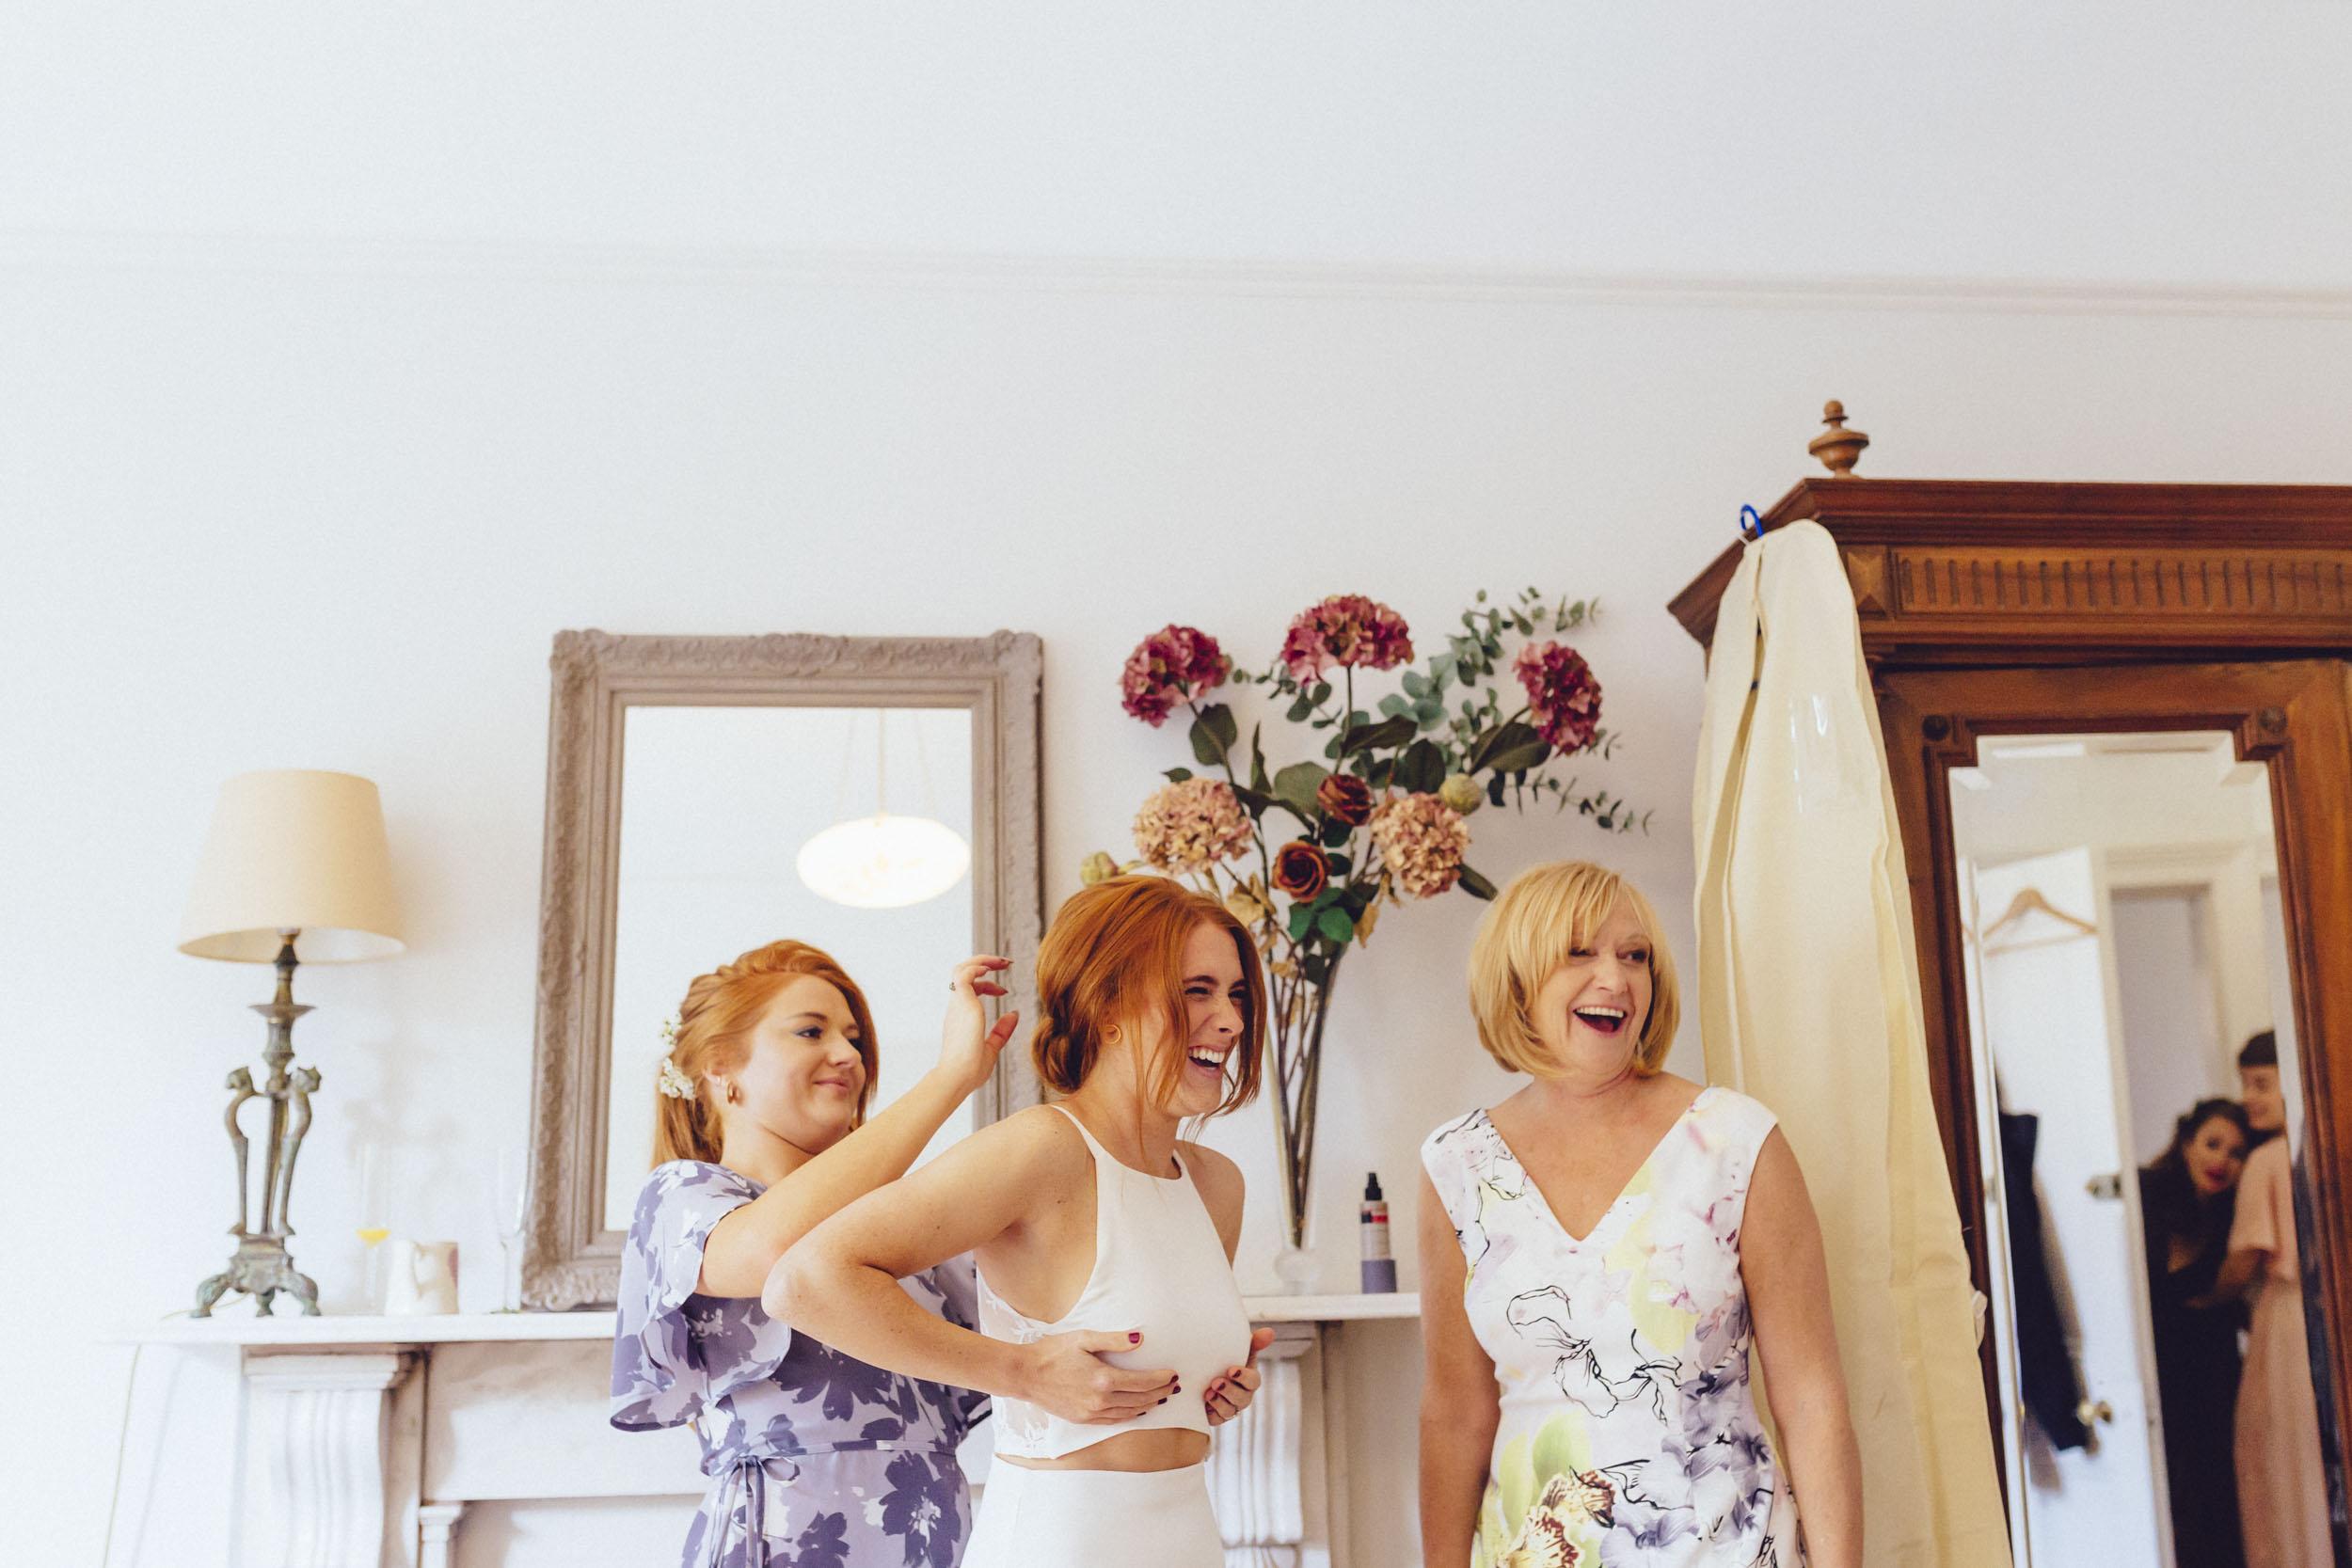 Brockworth court barn-unconventional fun wedding photography006.jpg